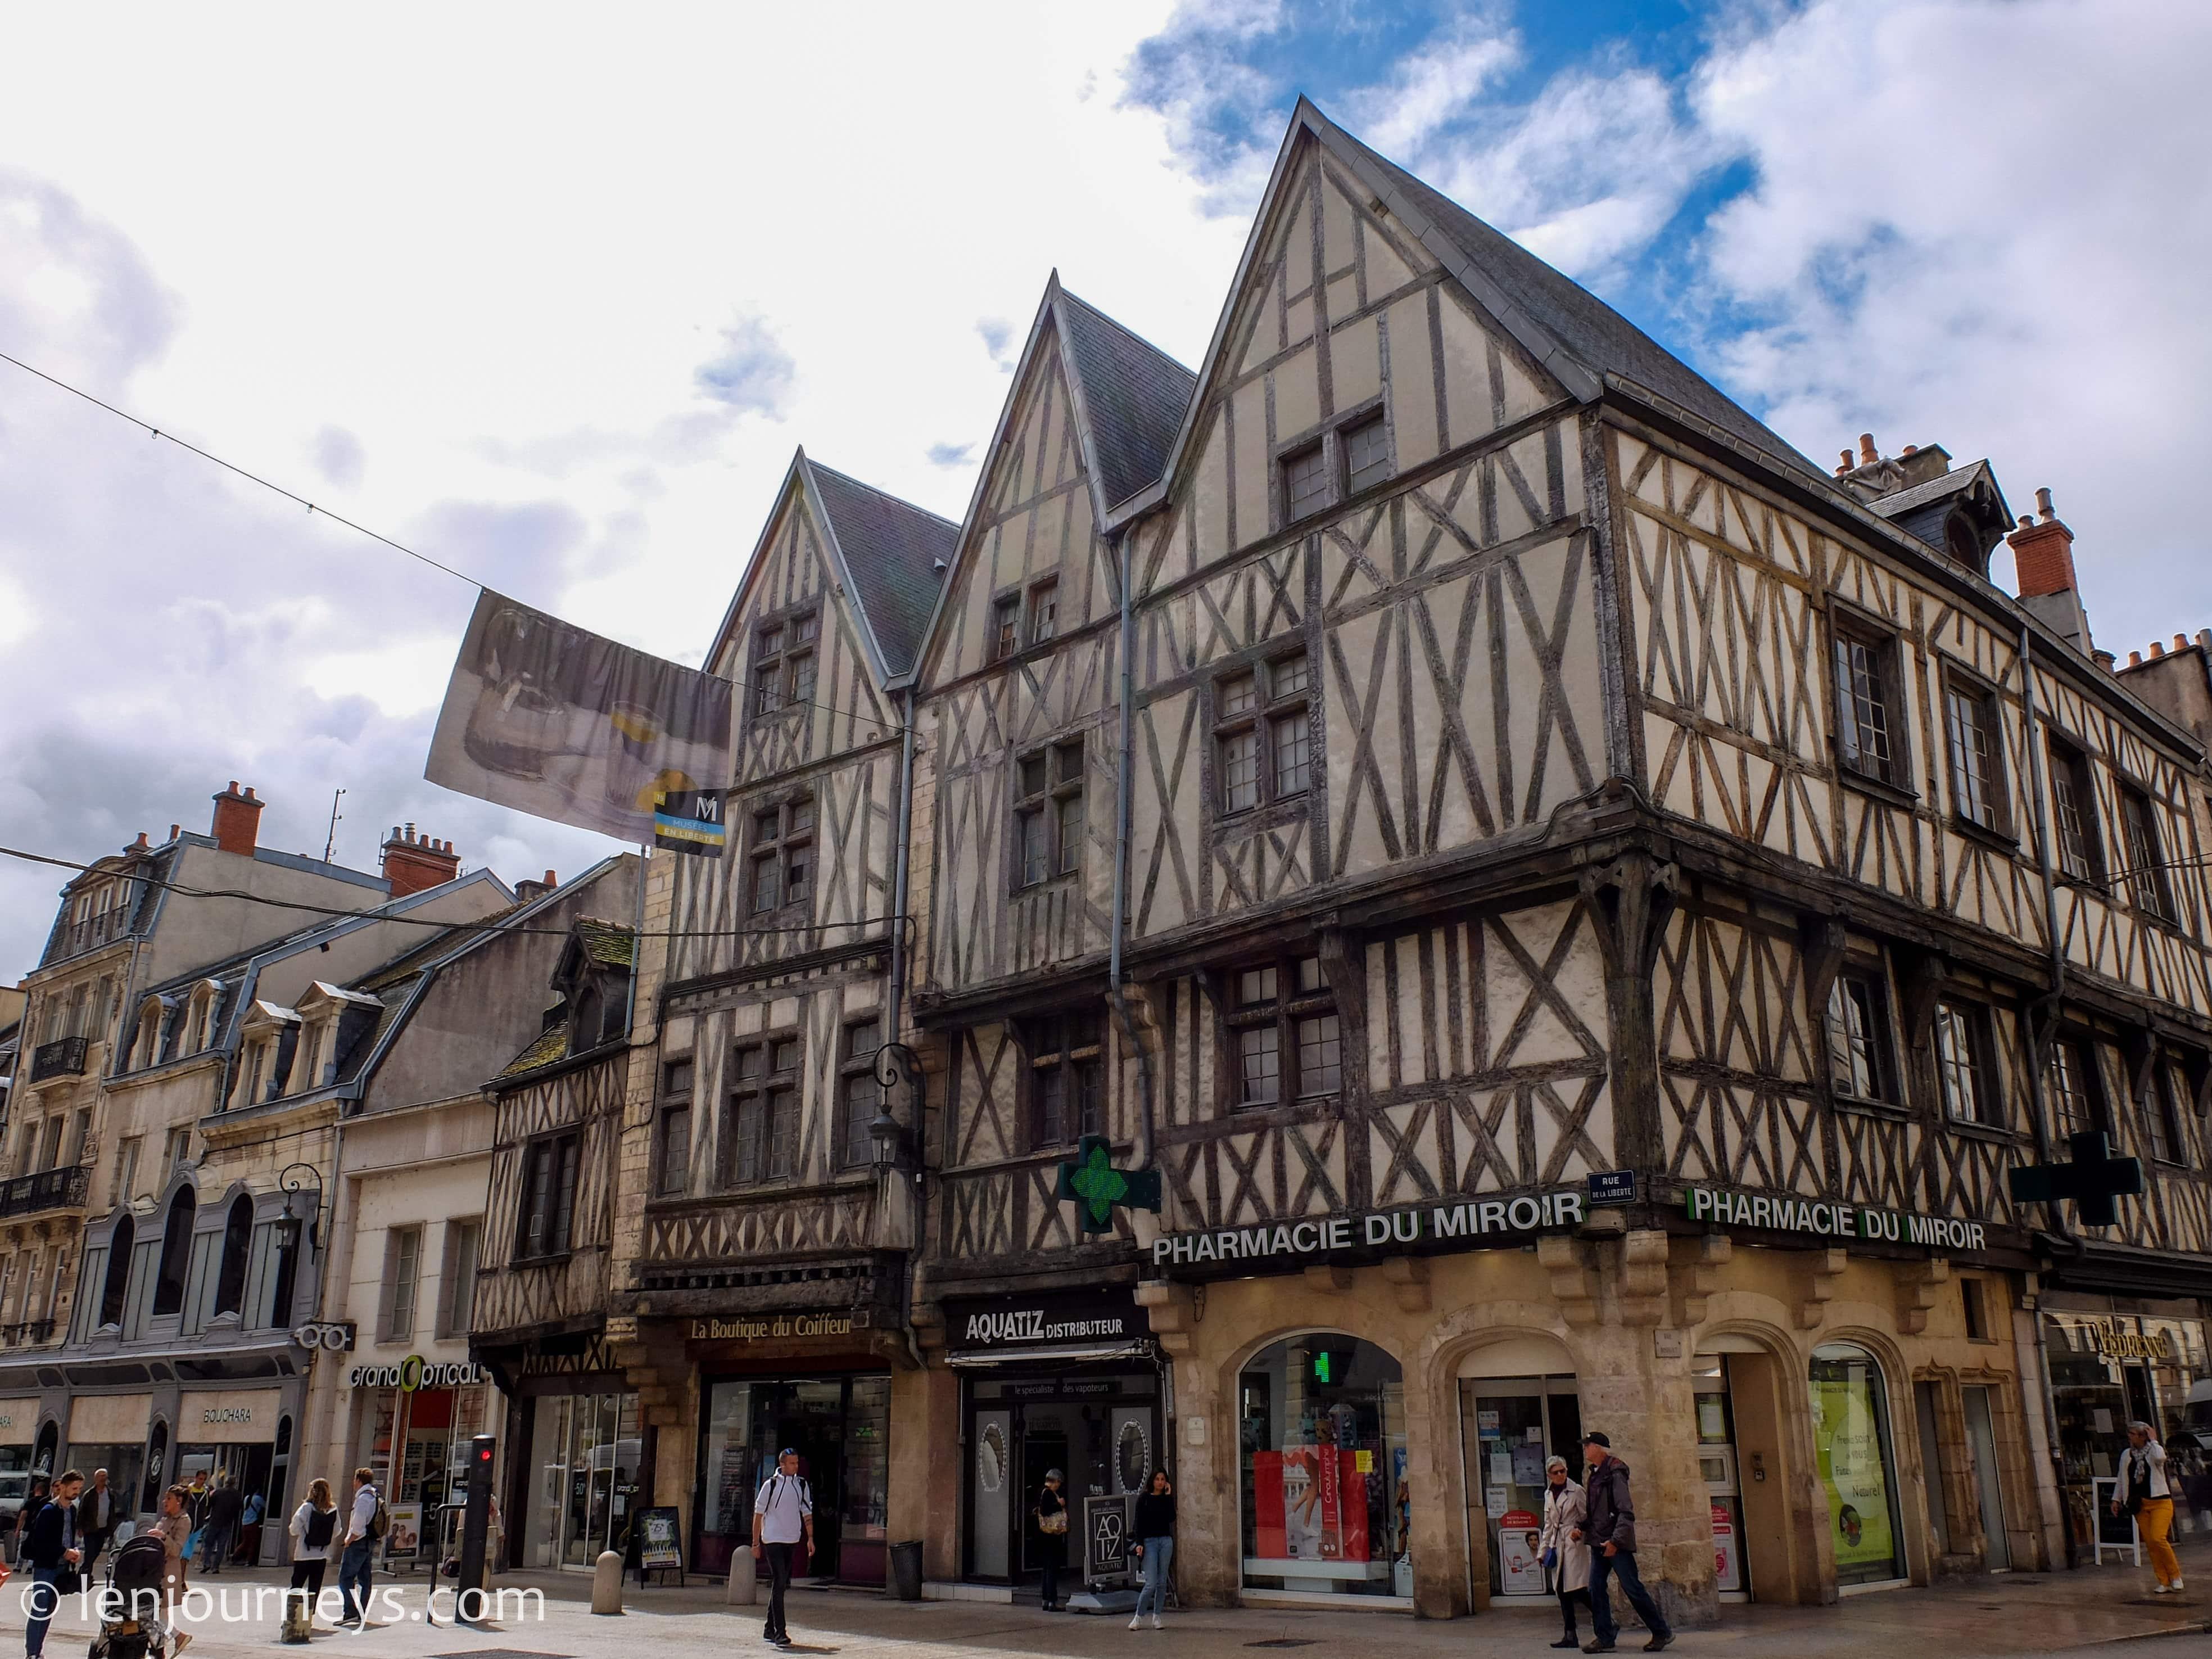 An old house in Dijon